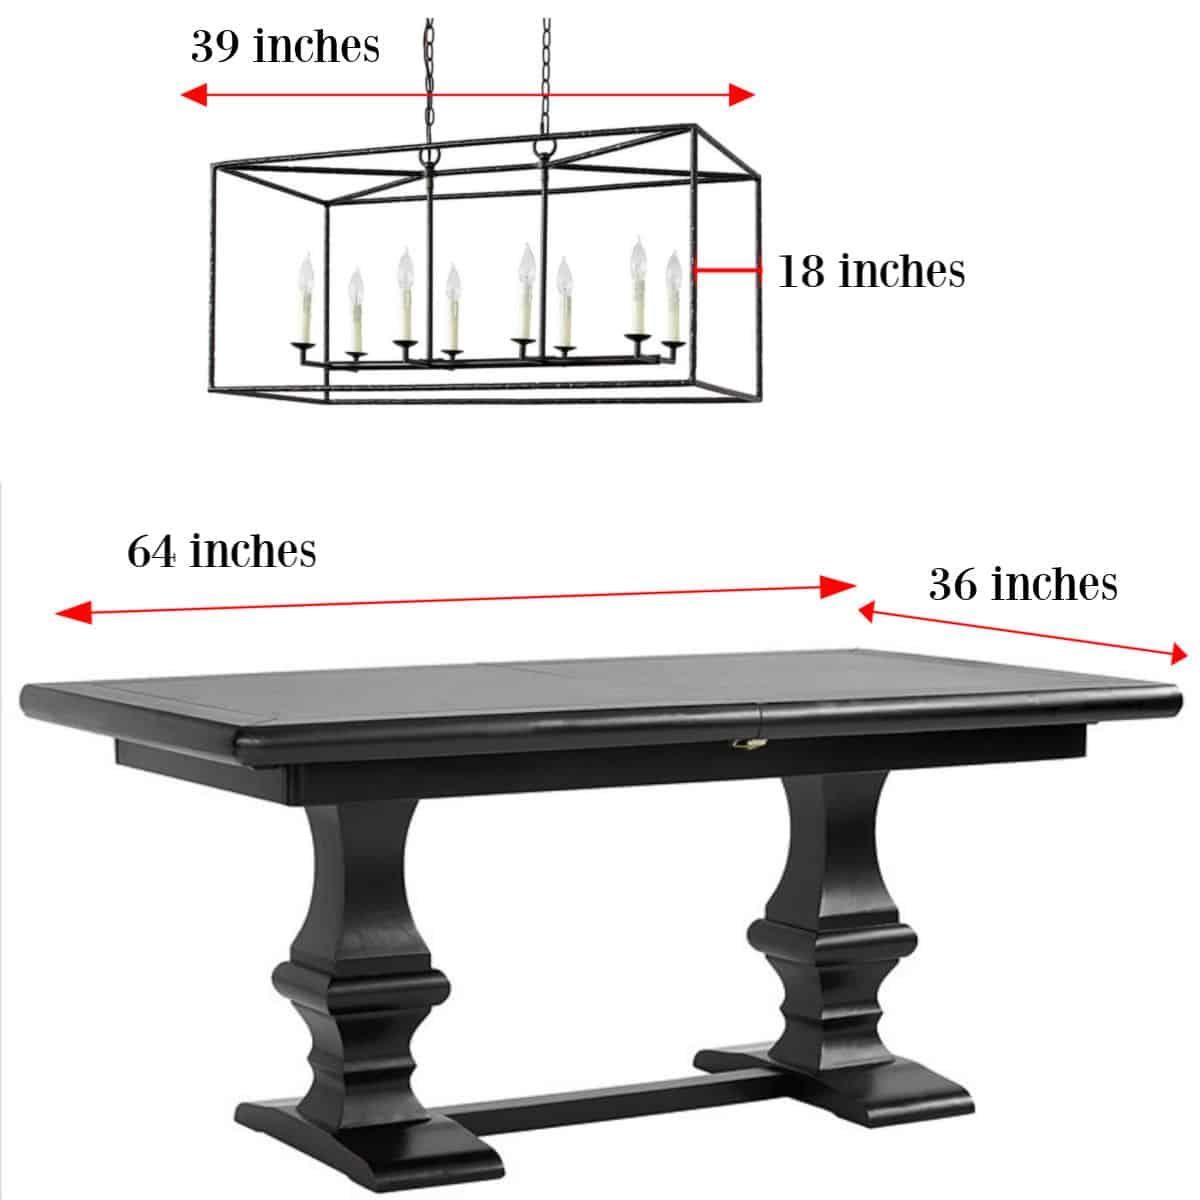 Chandelier Size Guide How Big Should My Chandelier Be Design Morsels Lights Over Dining Table Long Dining Room Tables Dining Table Guide